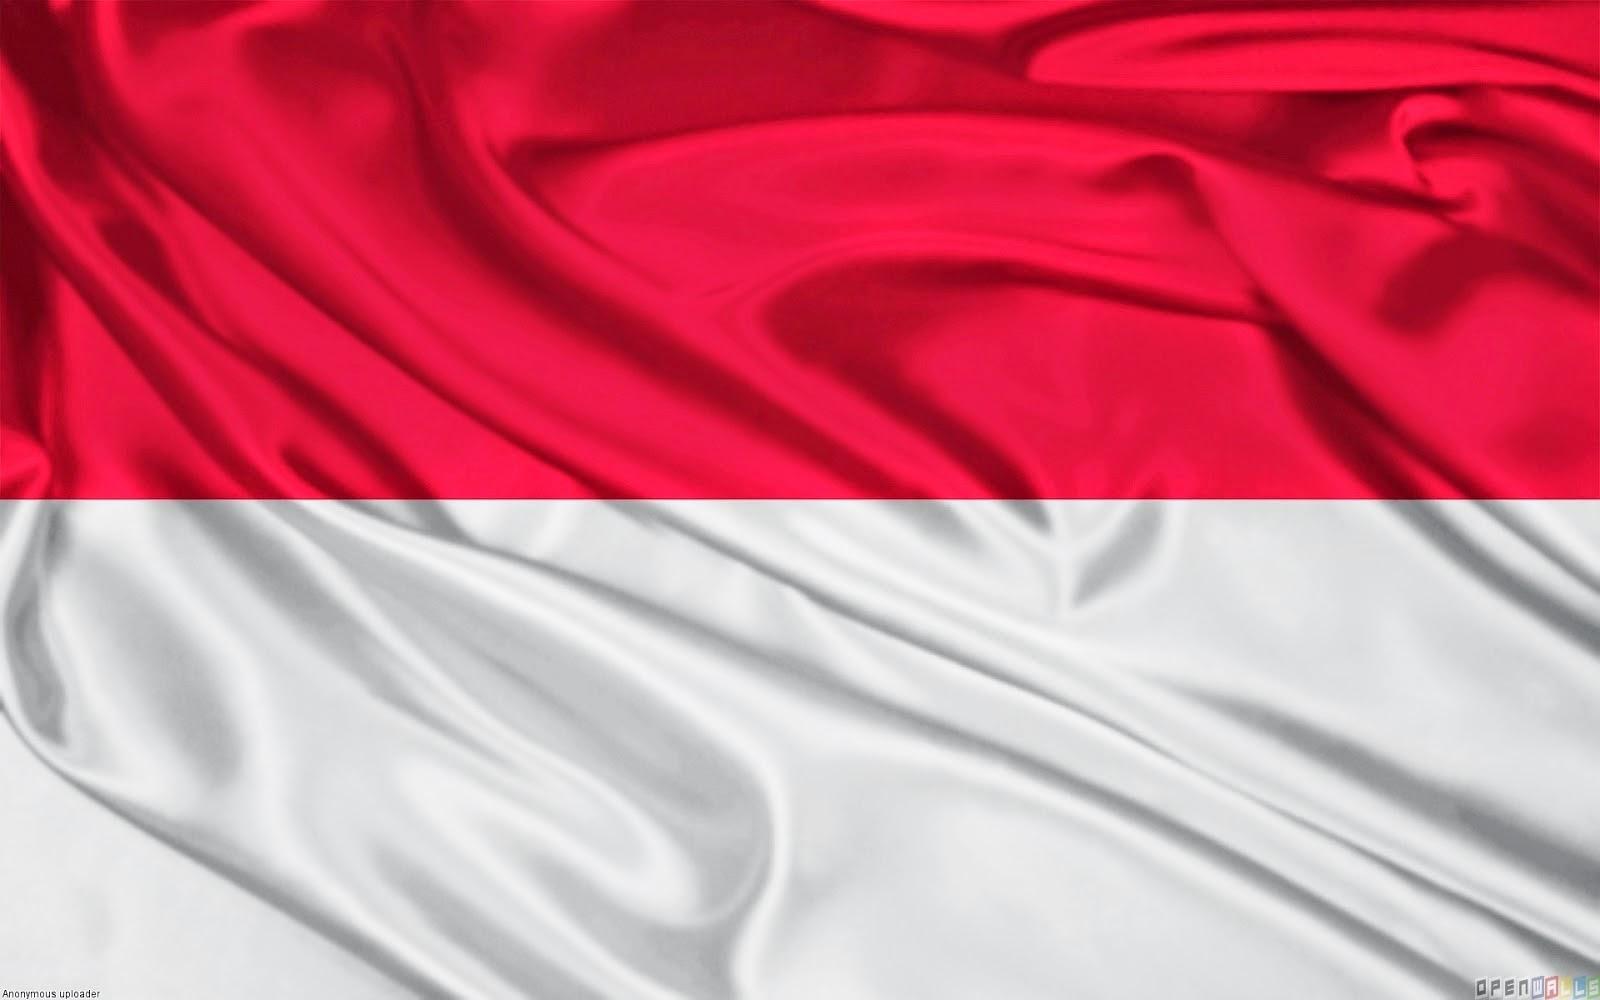 Gambar Bendera Merah Putih Peringatan 17 Agustus Hari Kemerdekaan Indonesia